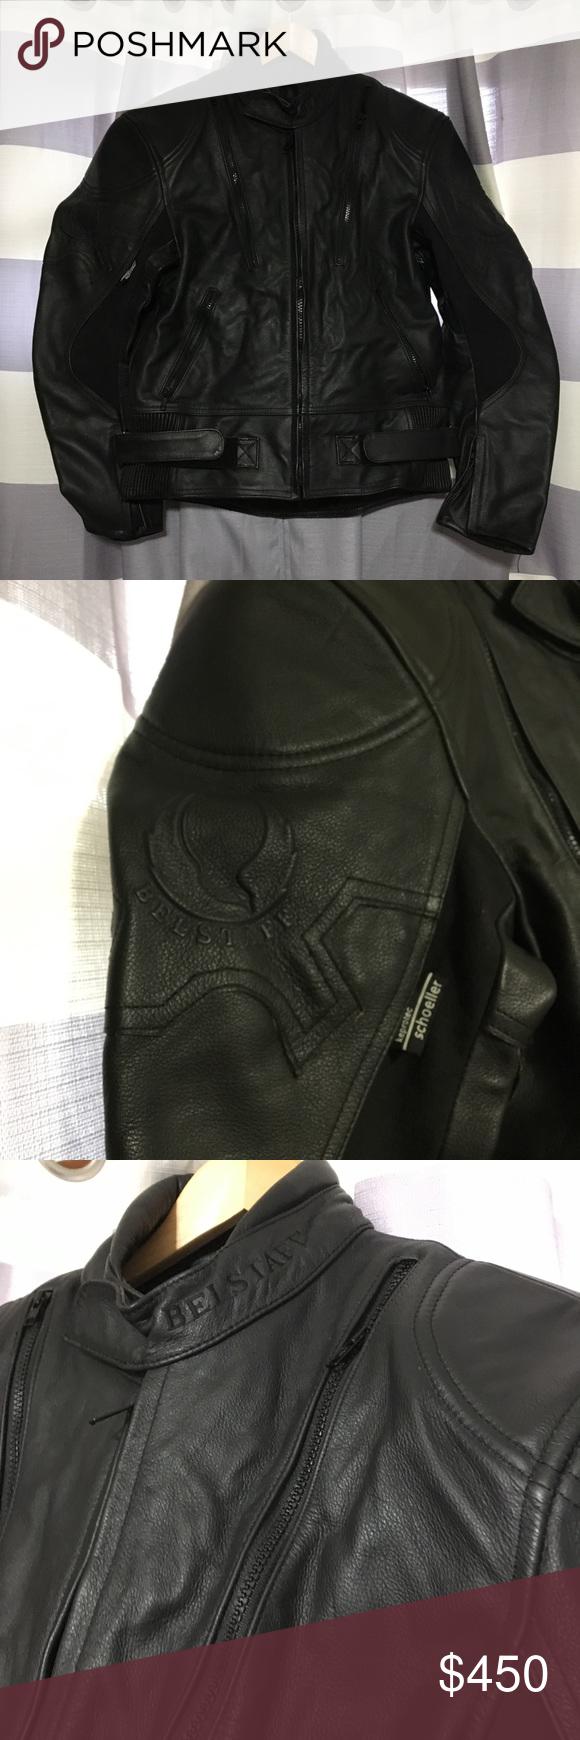 eximir amortiguar etiqueta  Men's Belstaff Keprotec Schooler Leather Jacket This is a very nice men's  Belstaff Keprotec Schoeller leather moto jack…   Leather jacket, Jackets,  Belstaff jackets